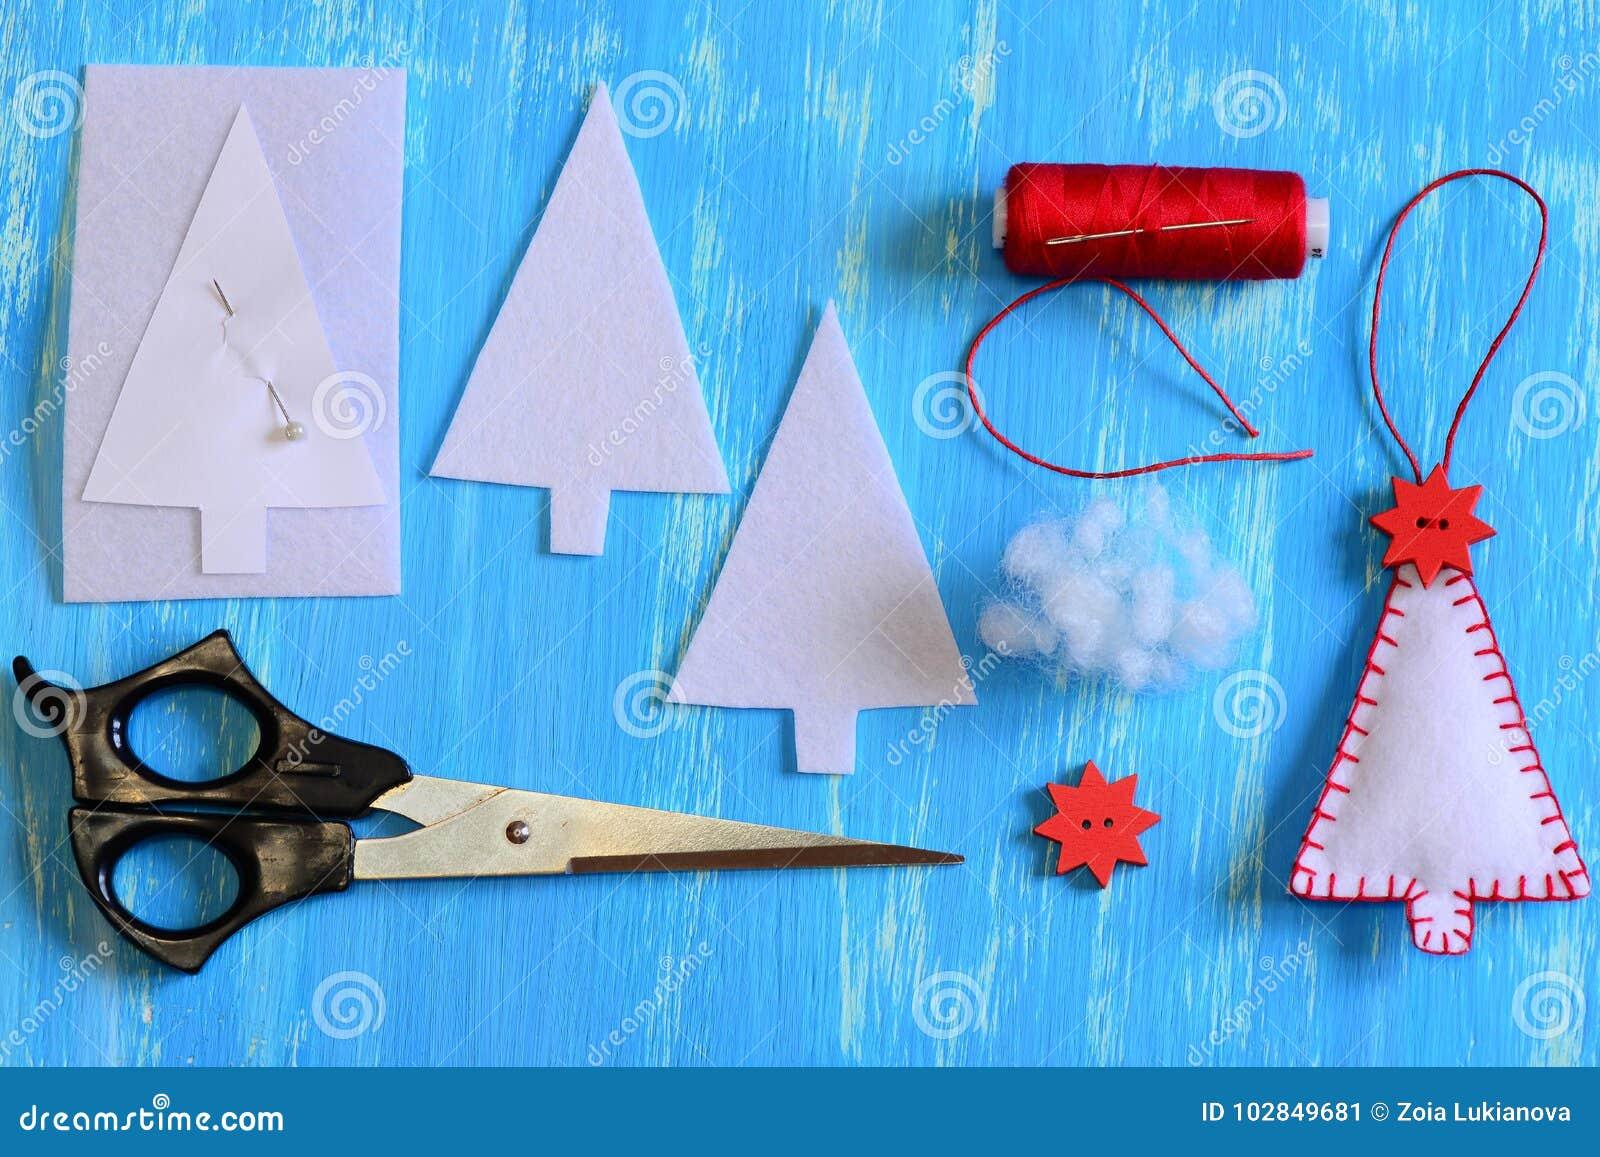 Handmade Felt Christmas Tree Paper Template Felt Details Thread